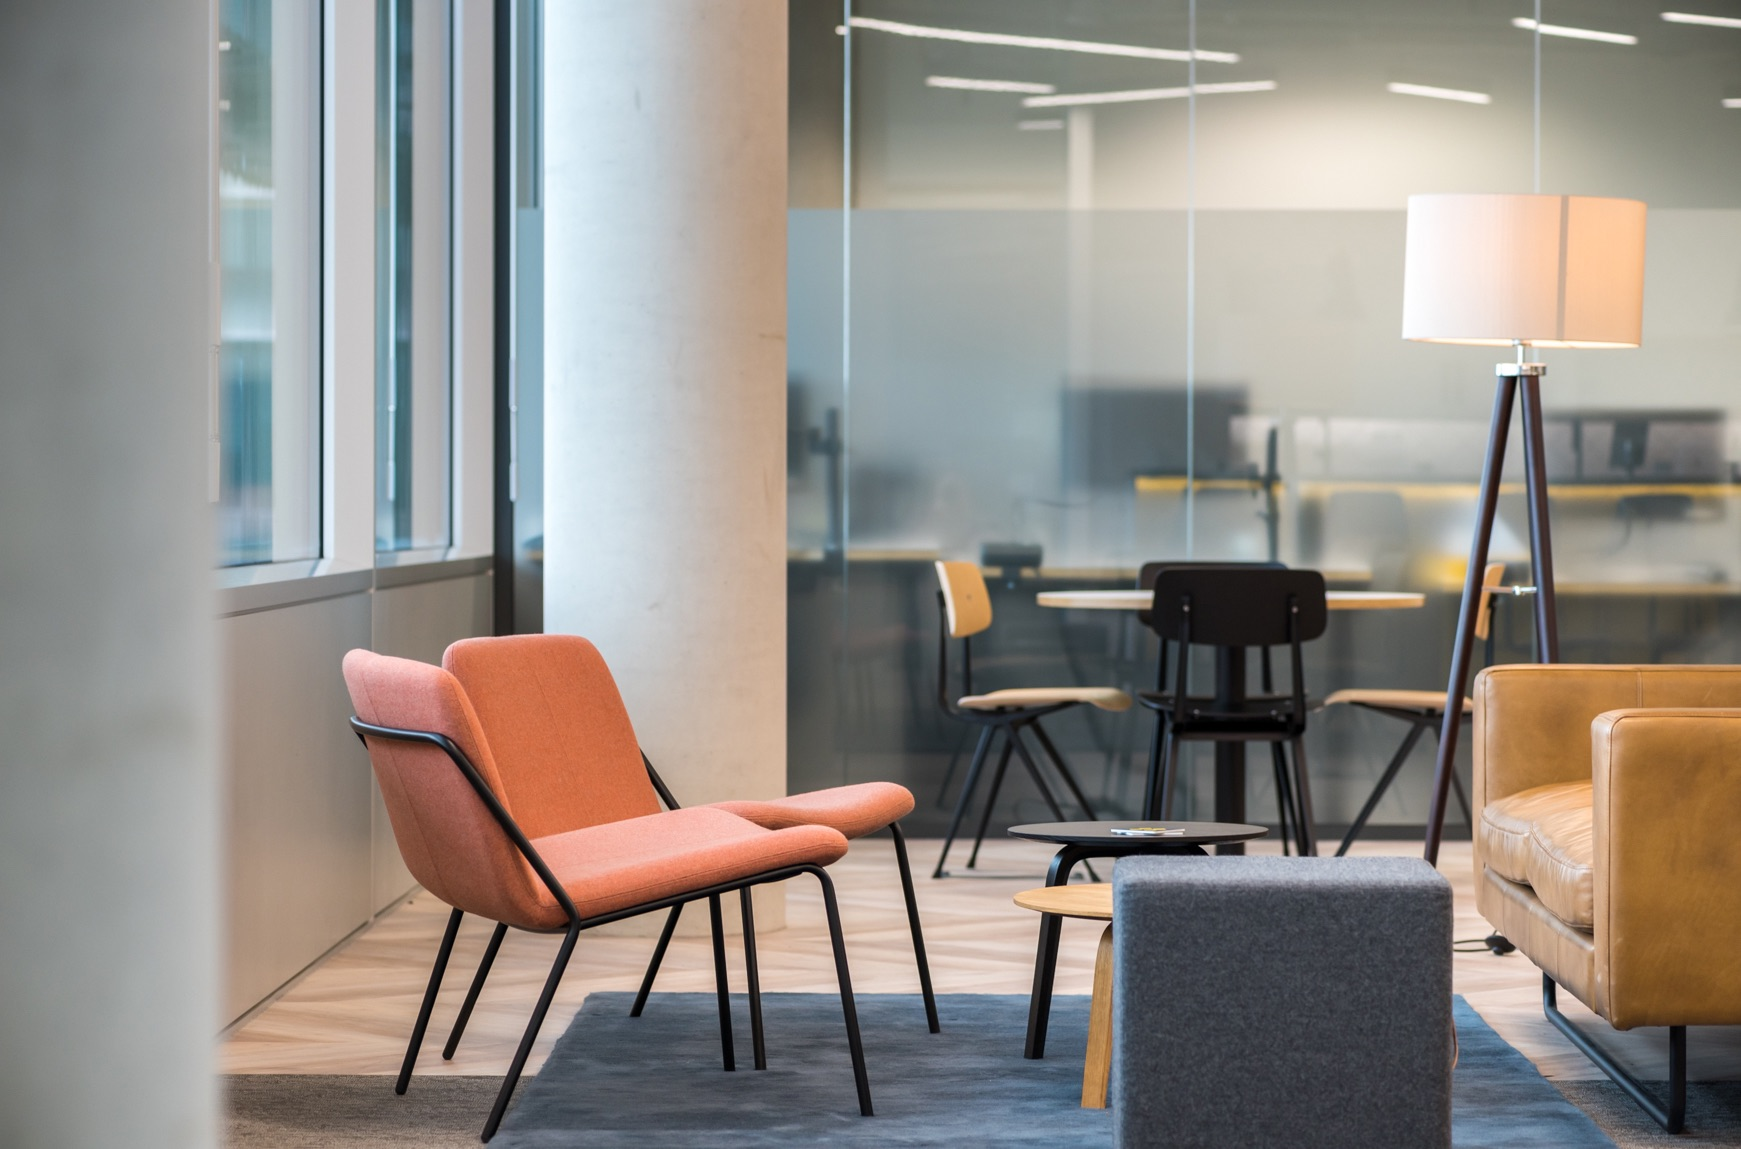 venture-x-london-office-6